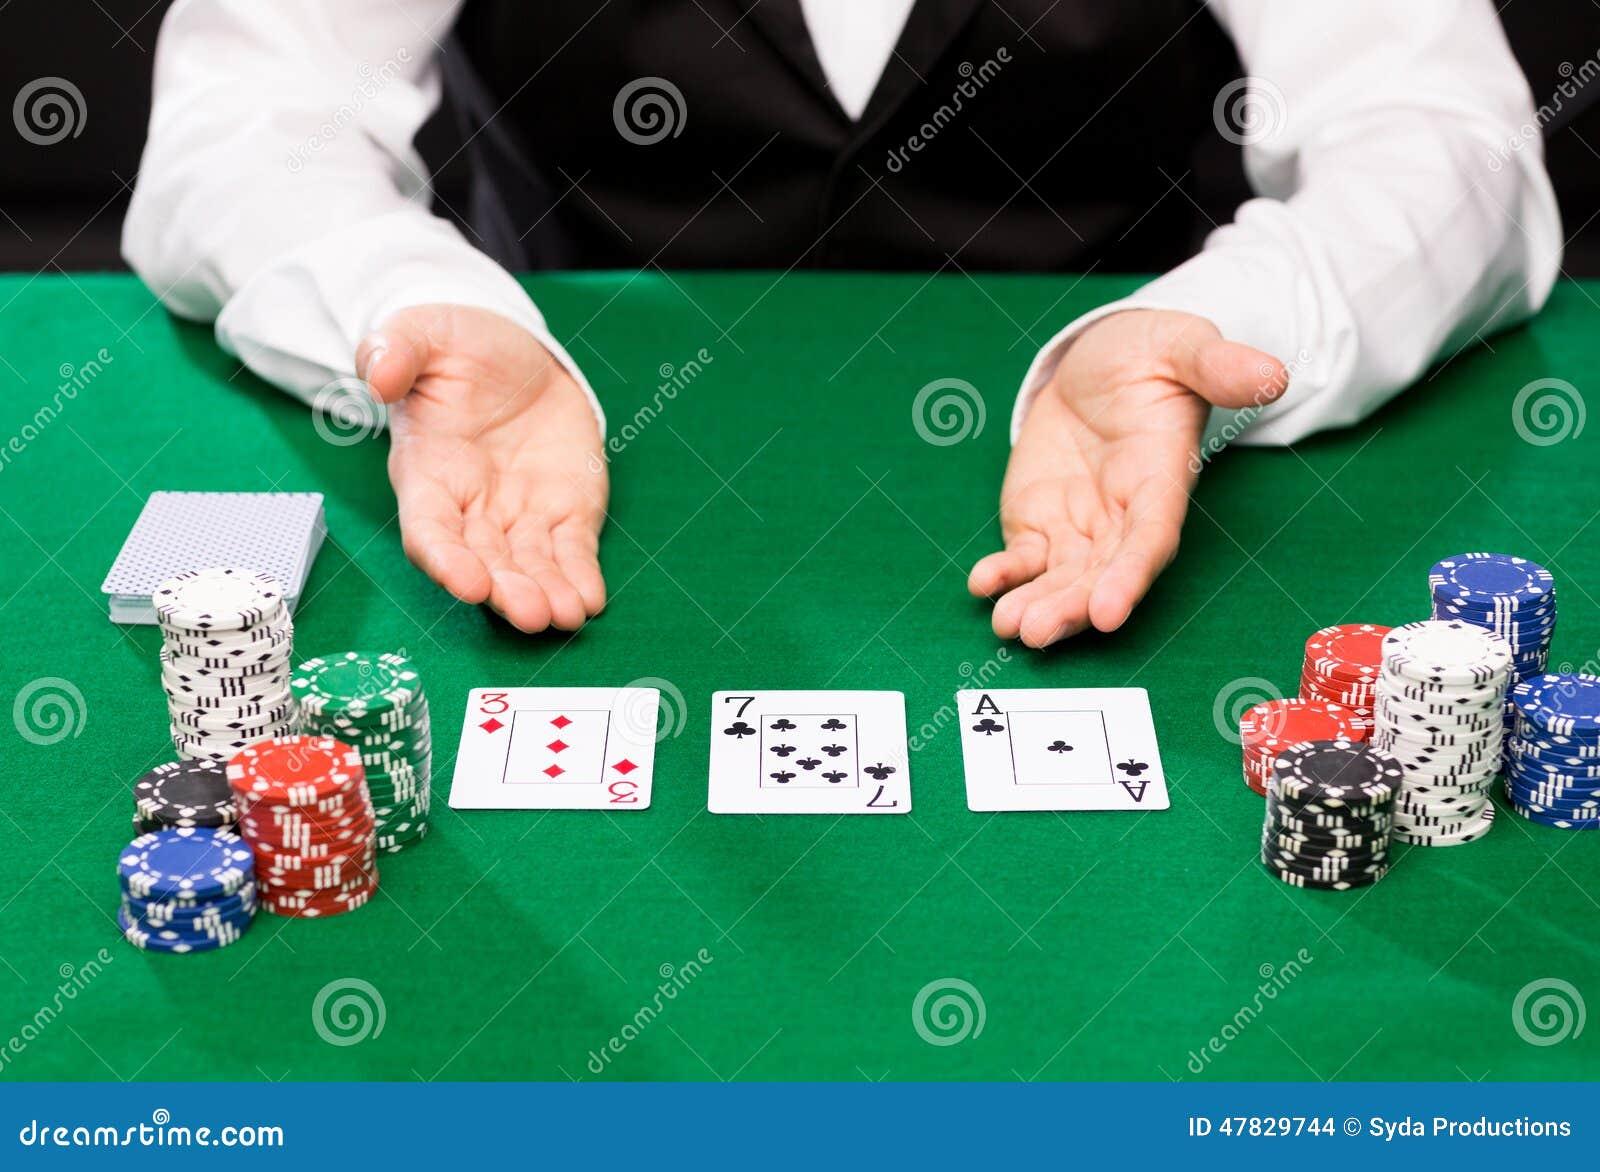 Play Slots Free Online